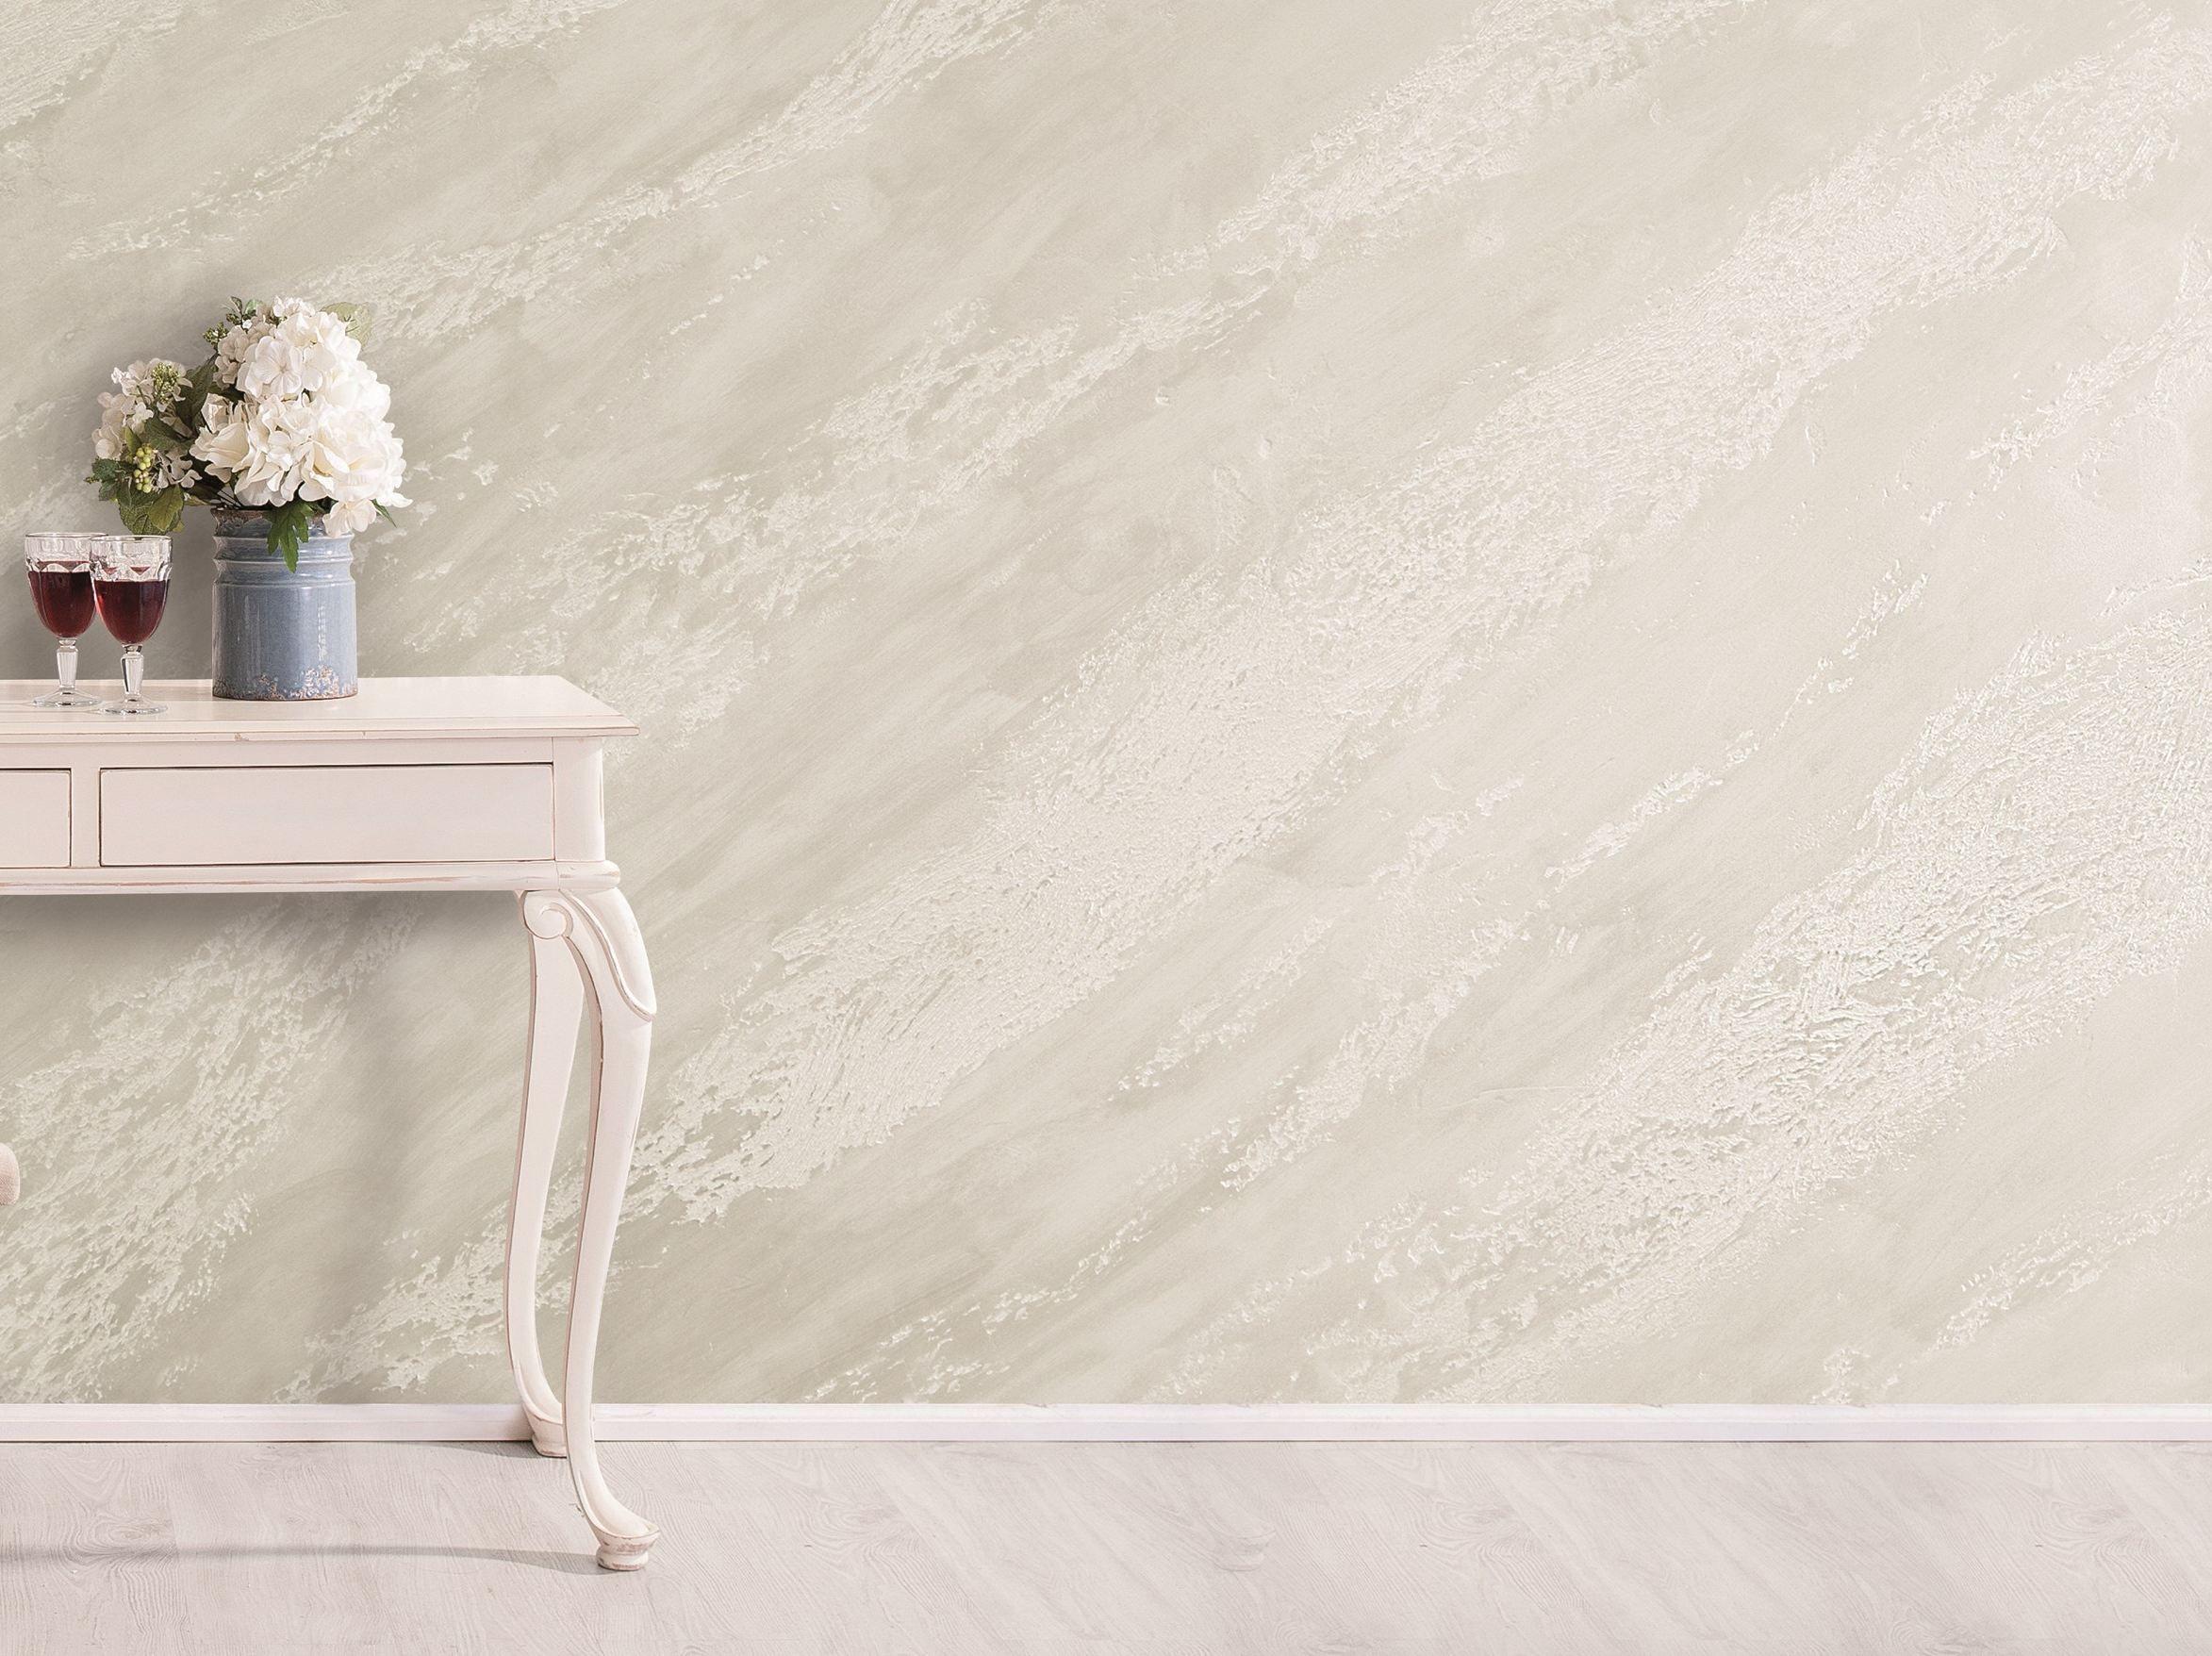 Meteore 10 marmorizzato by valpaint - Pitture decorative moderne ...